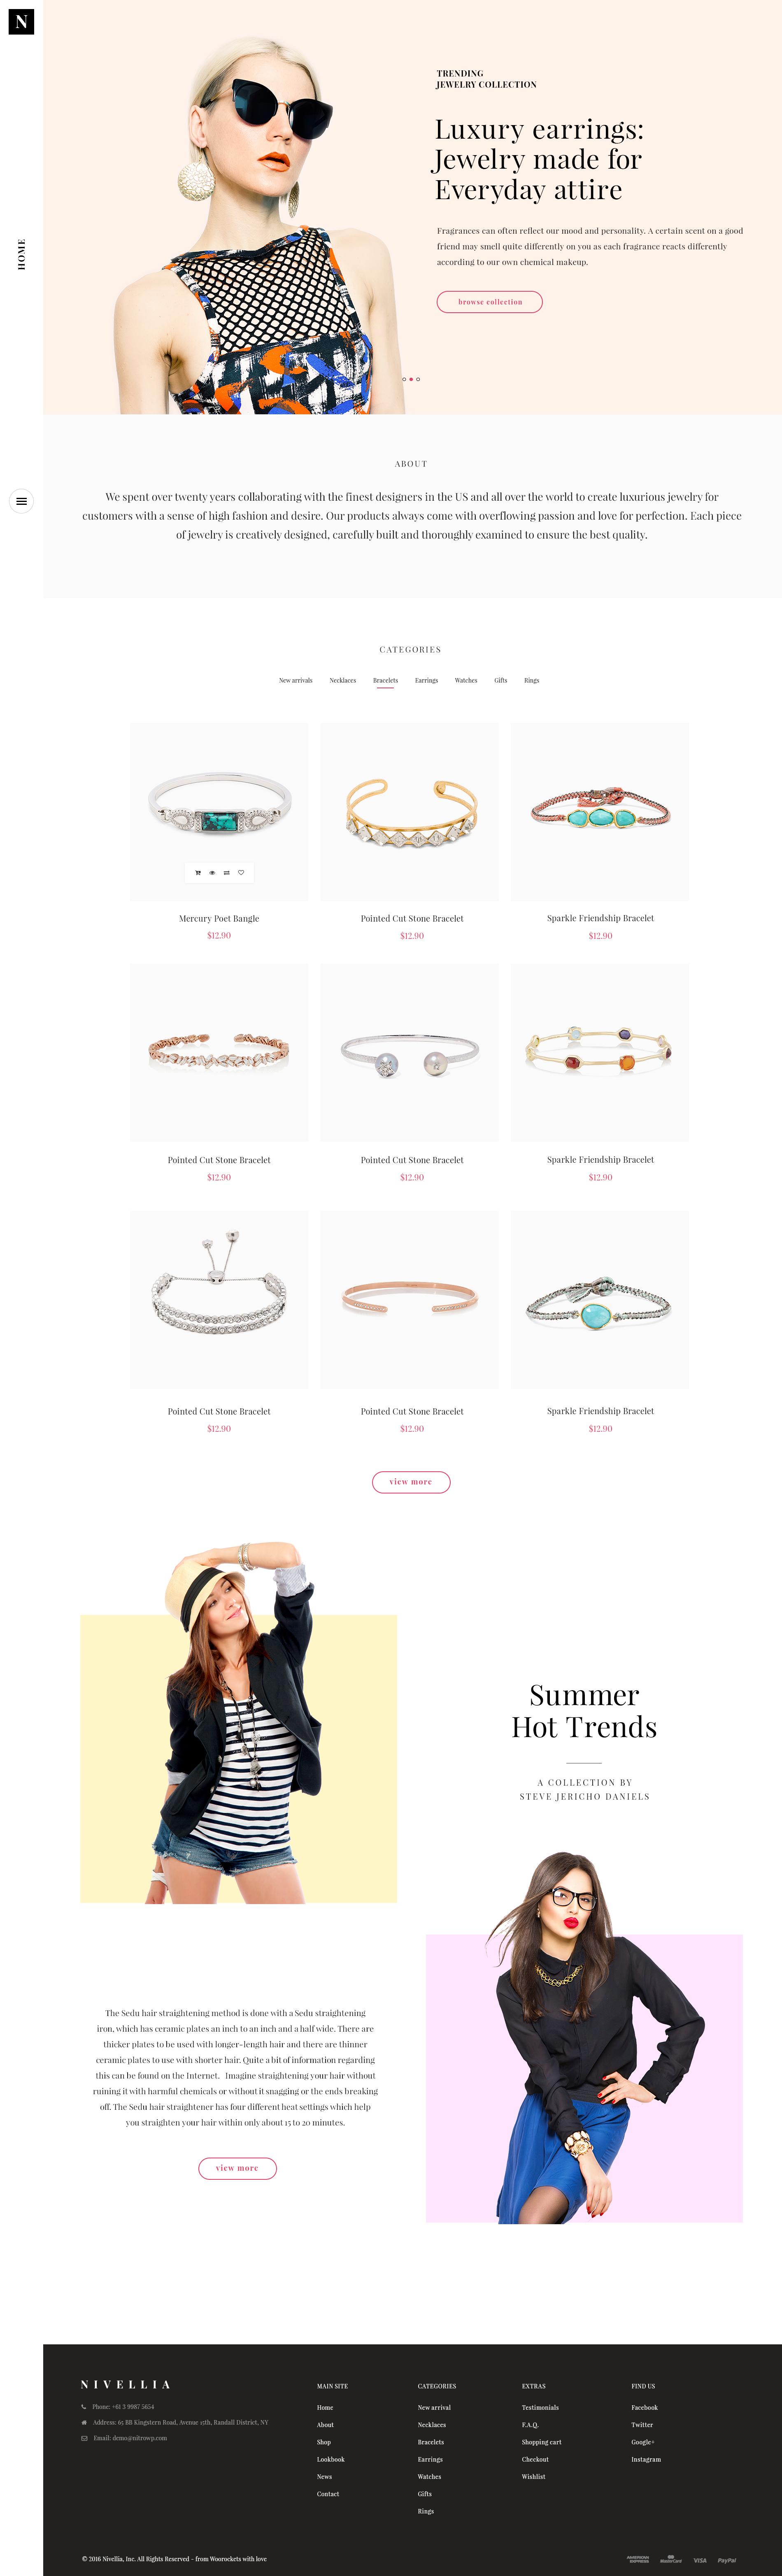 Shot jewelry attachment